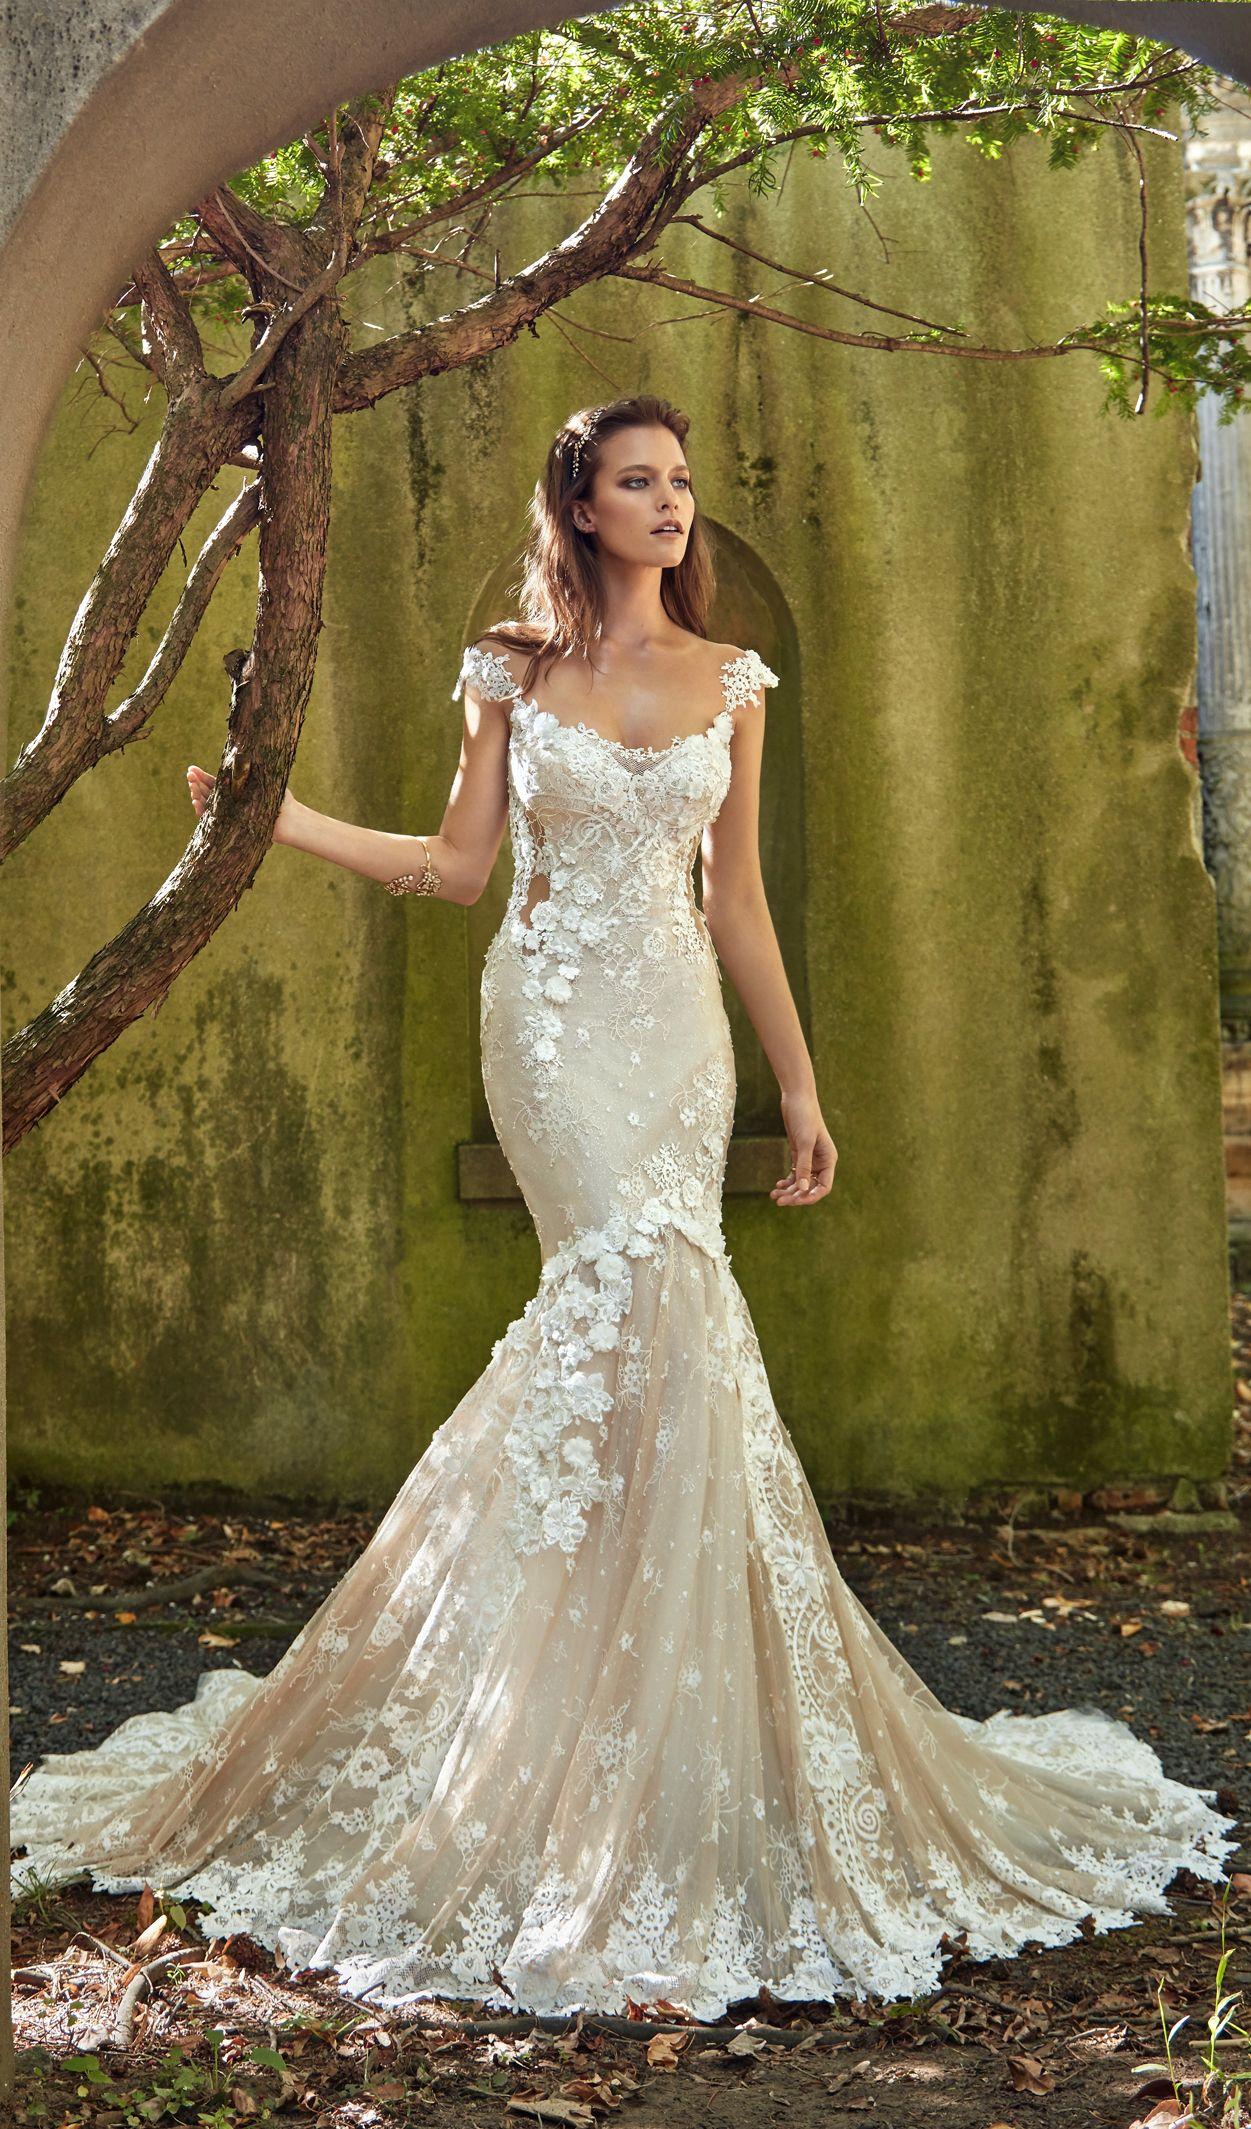 Secret Garden: Le Secret Royal Part II Brings Royalty To Wedding